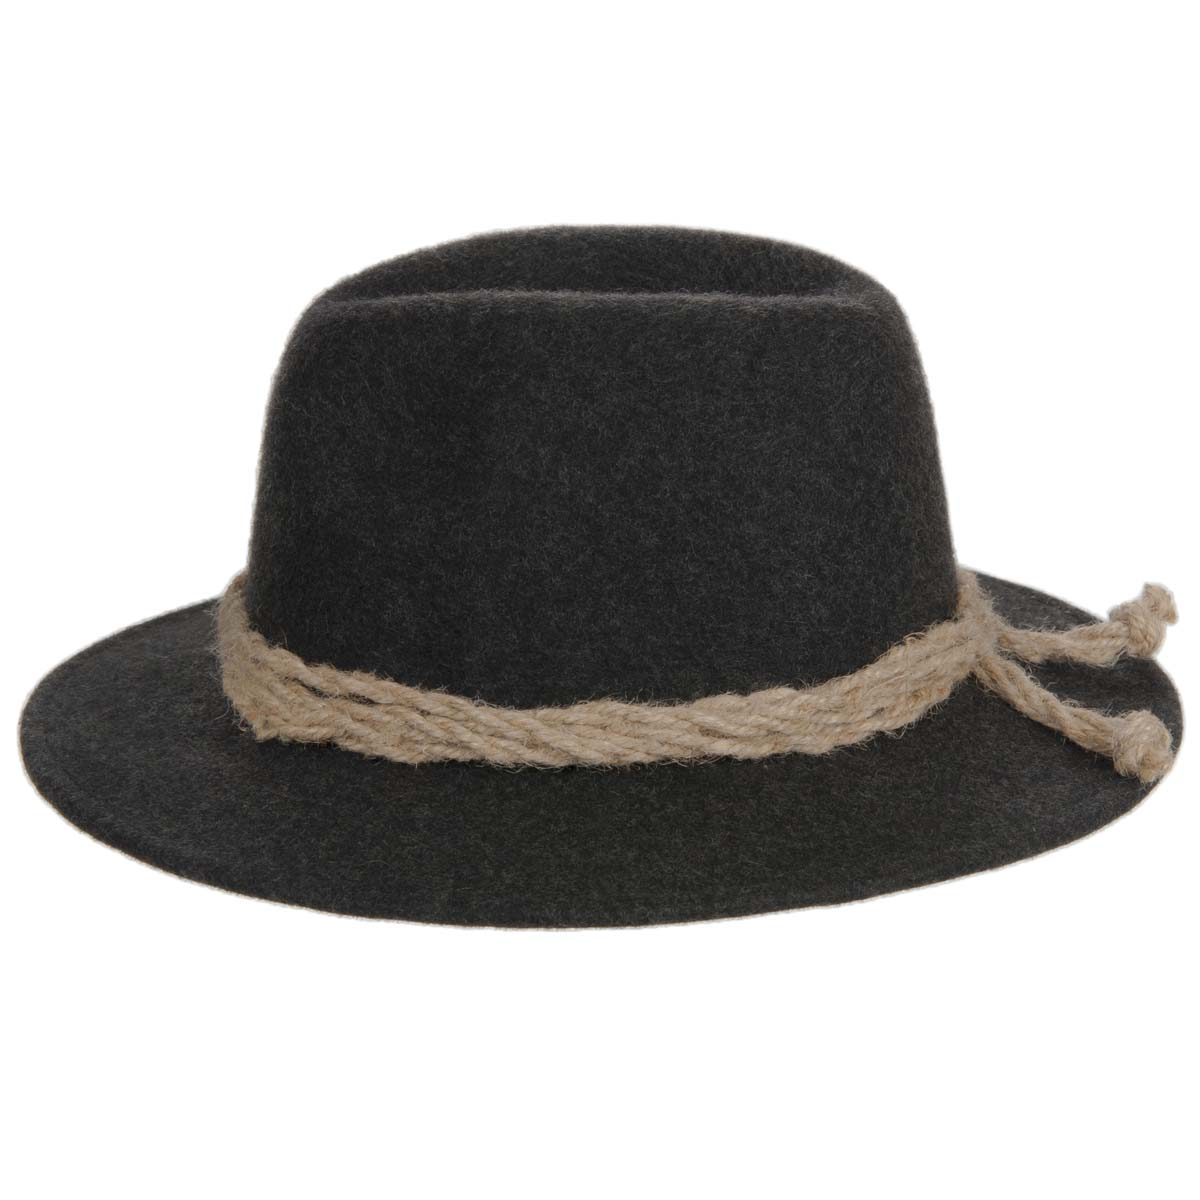 Cappello tirolese in feltro di lana Cappello tirolese in feltro di lana